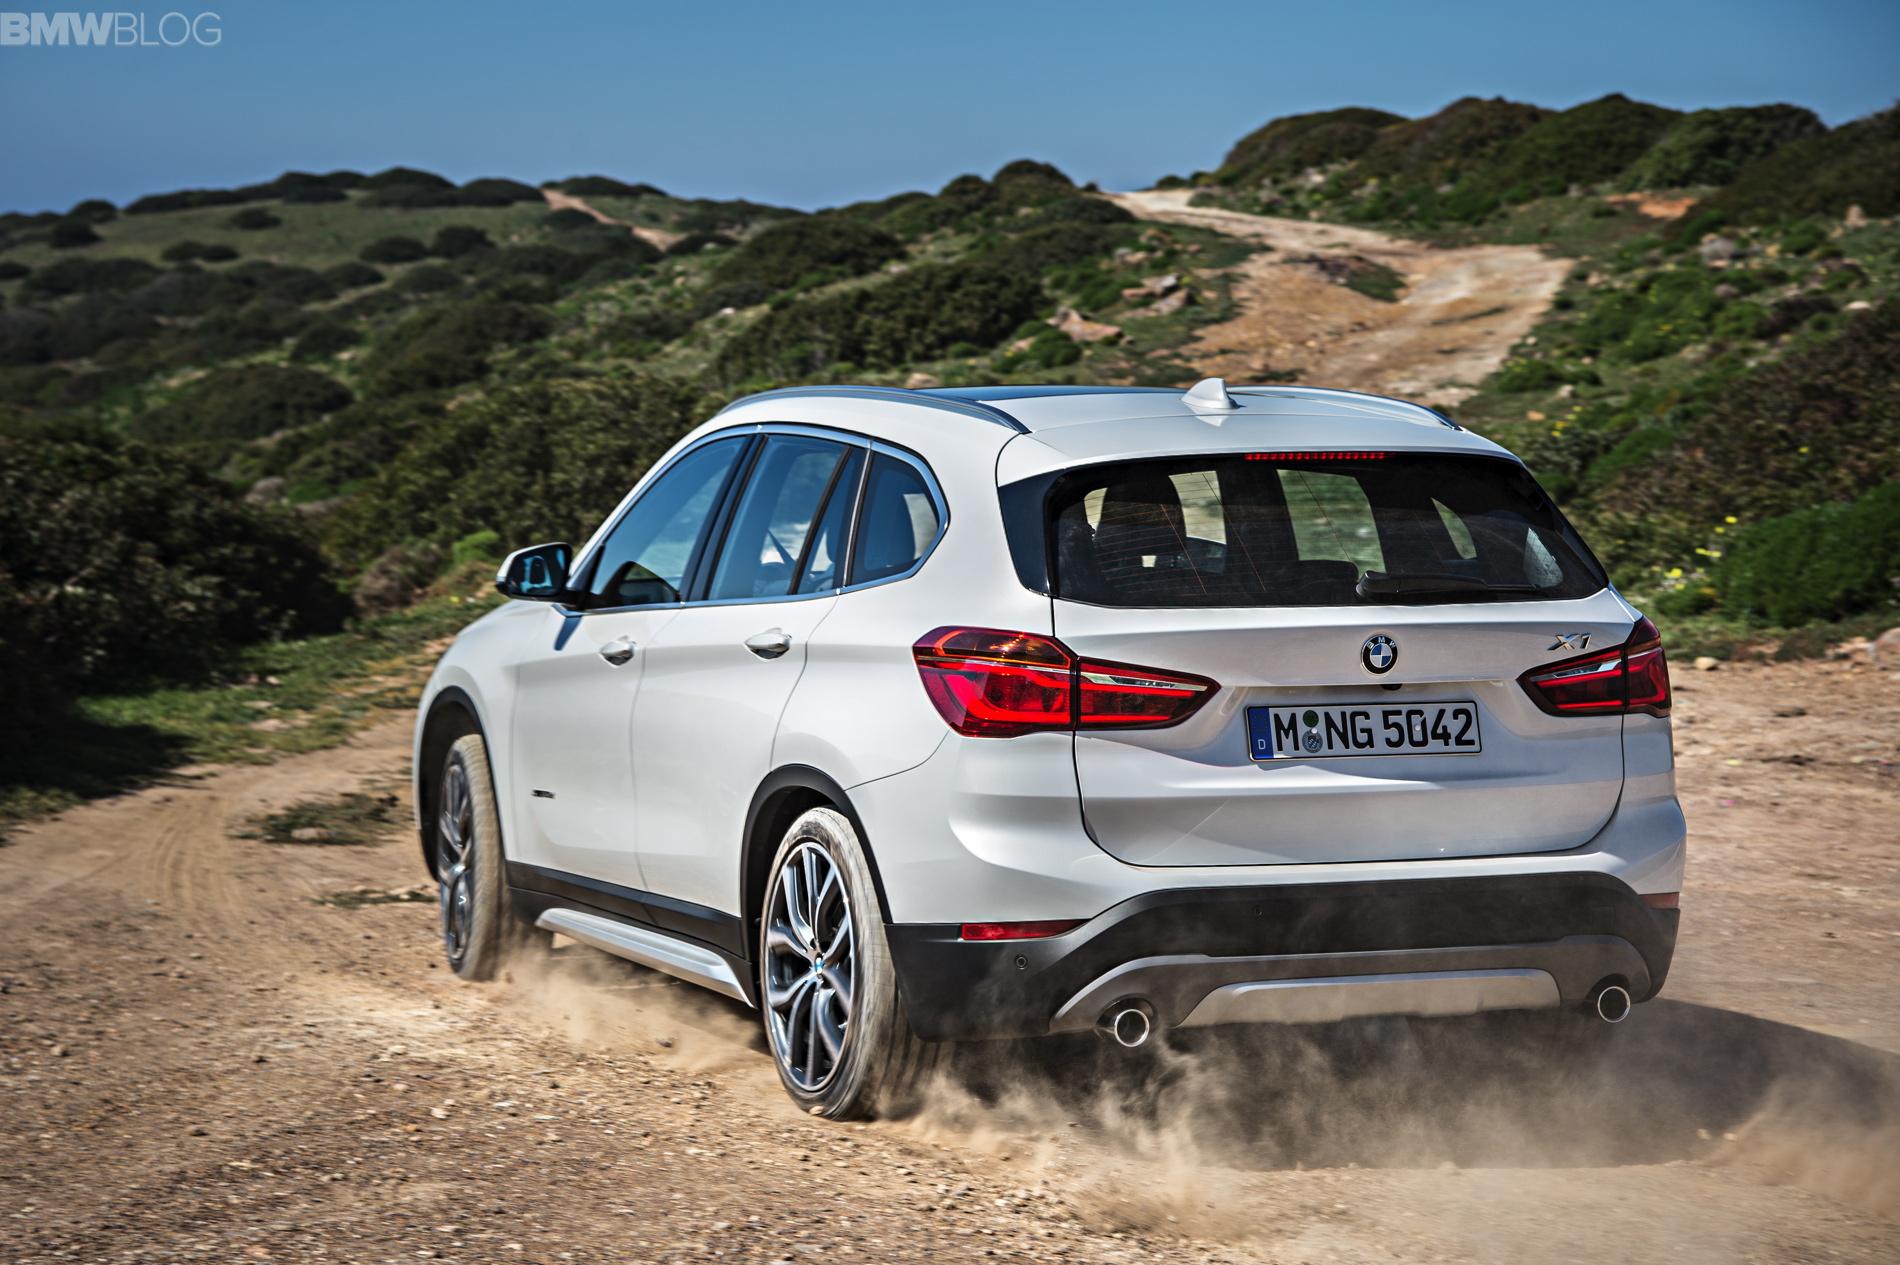 2016 BMW X1 exterior 1900x1200 images 36